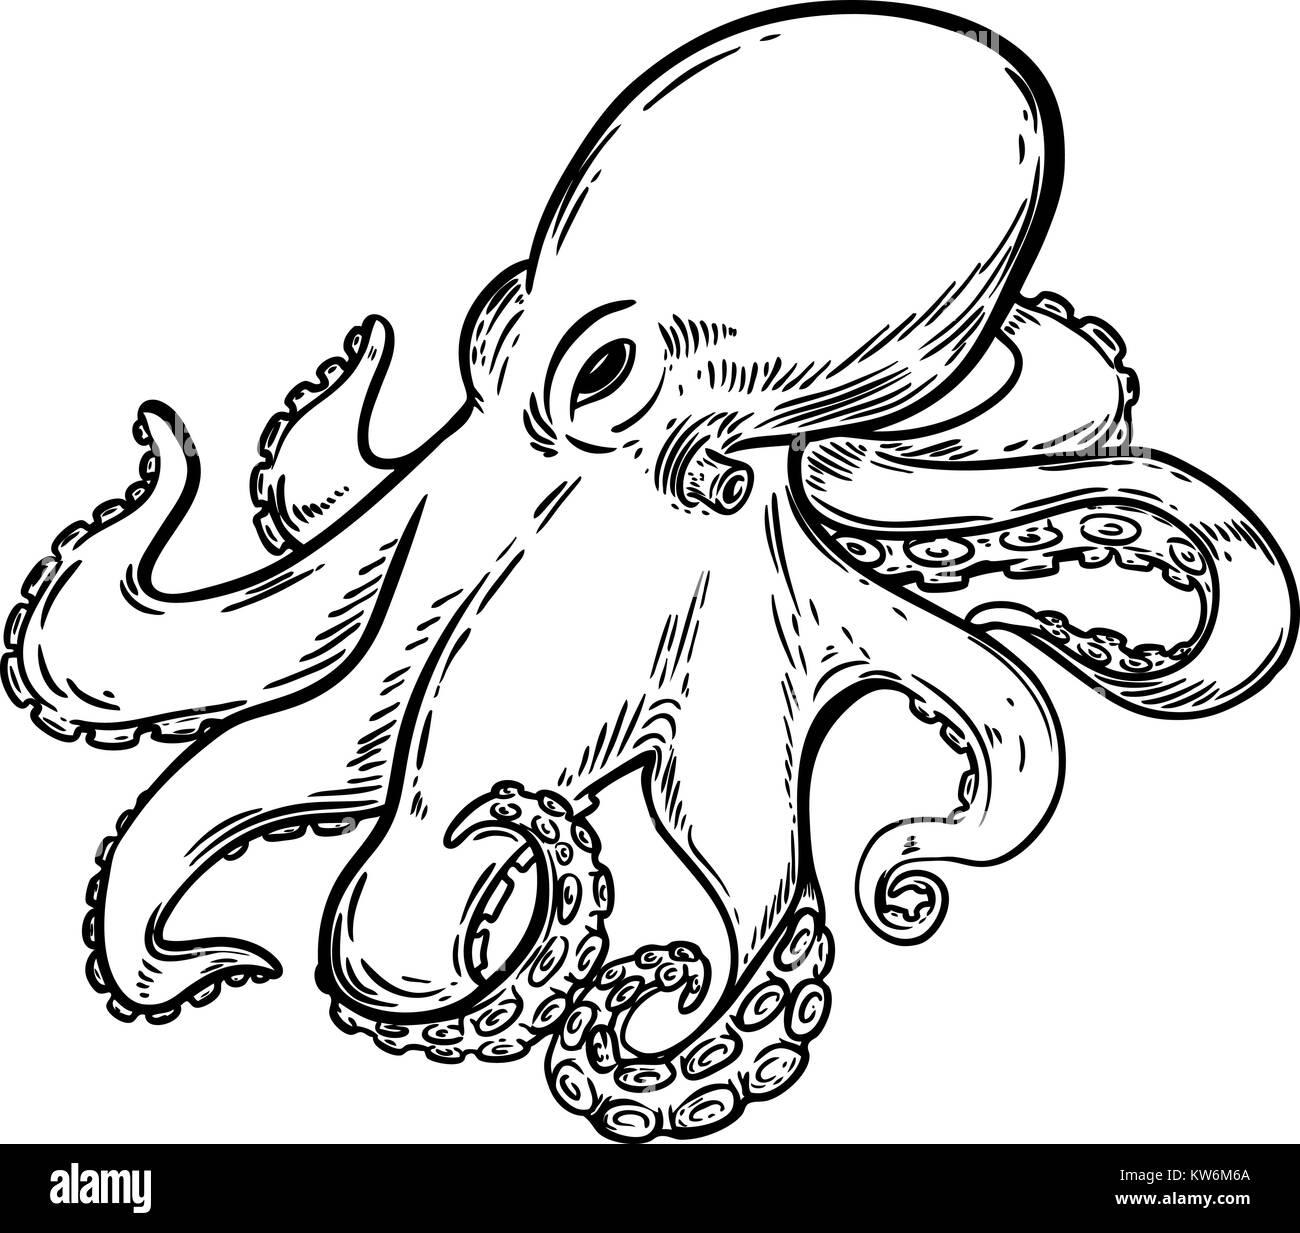 octopus illustration stockfotos  octopus illustration